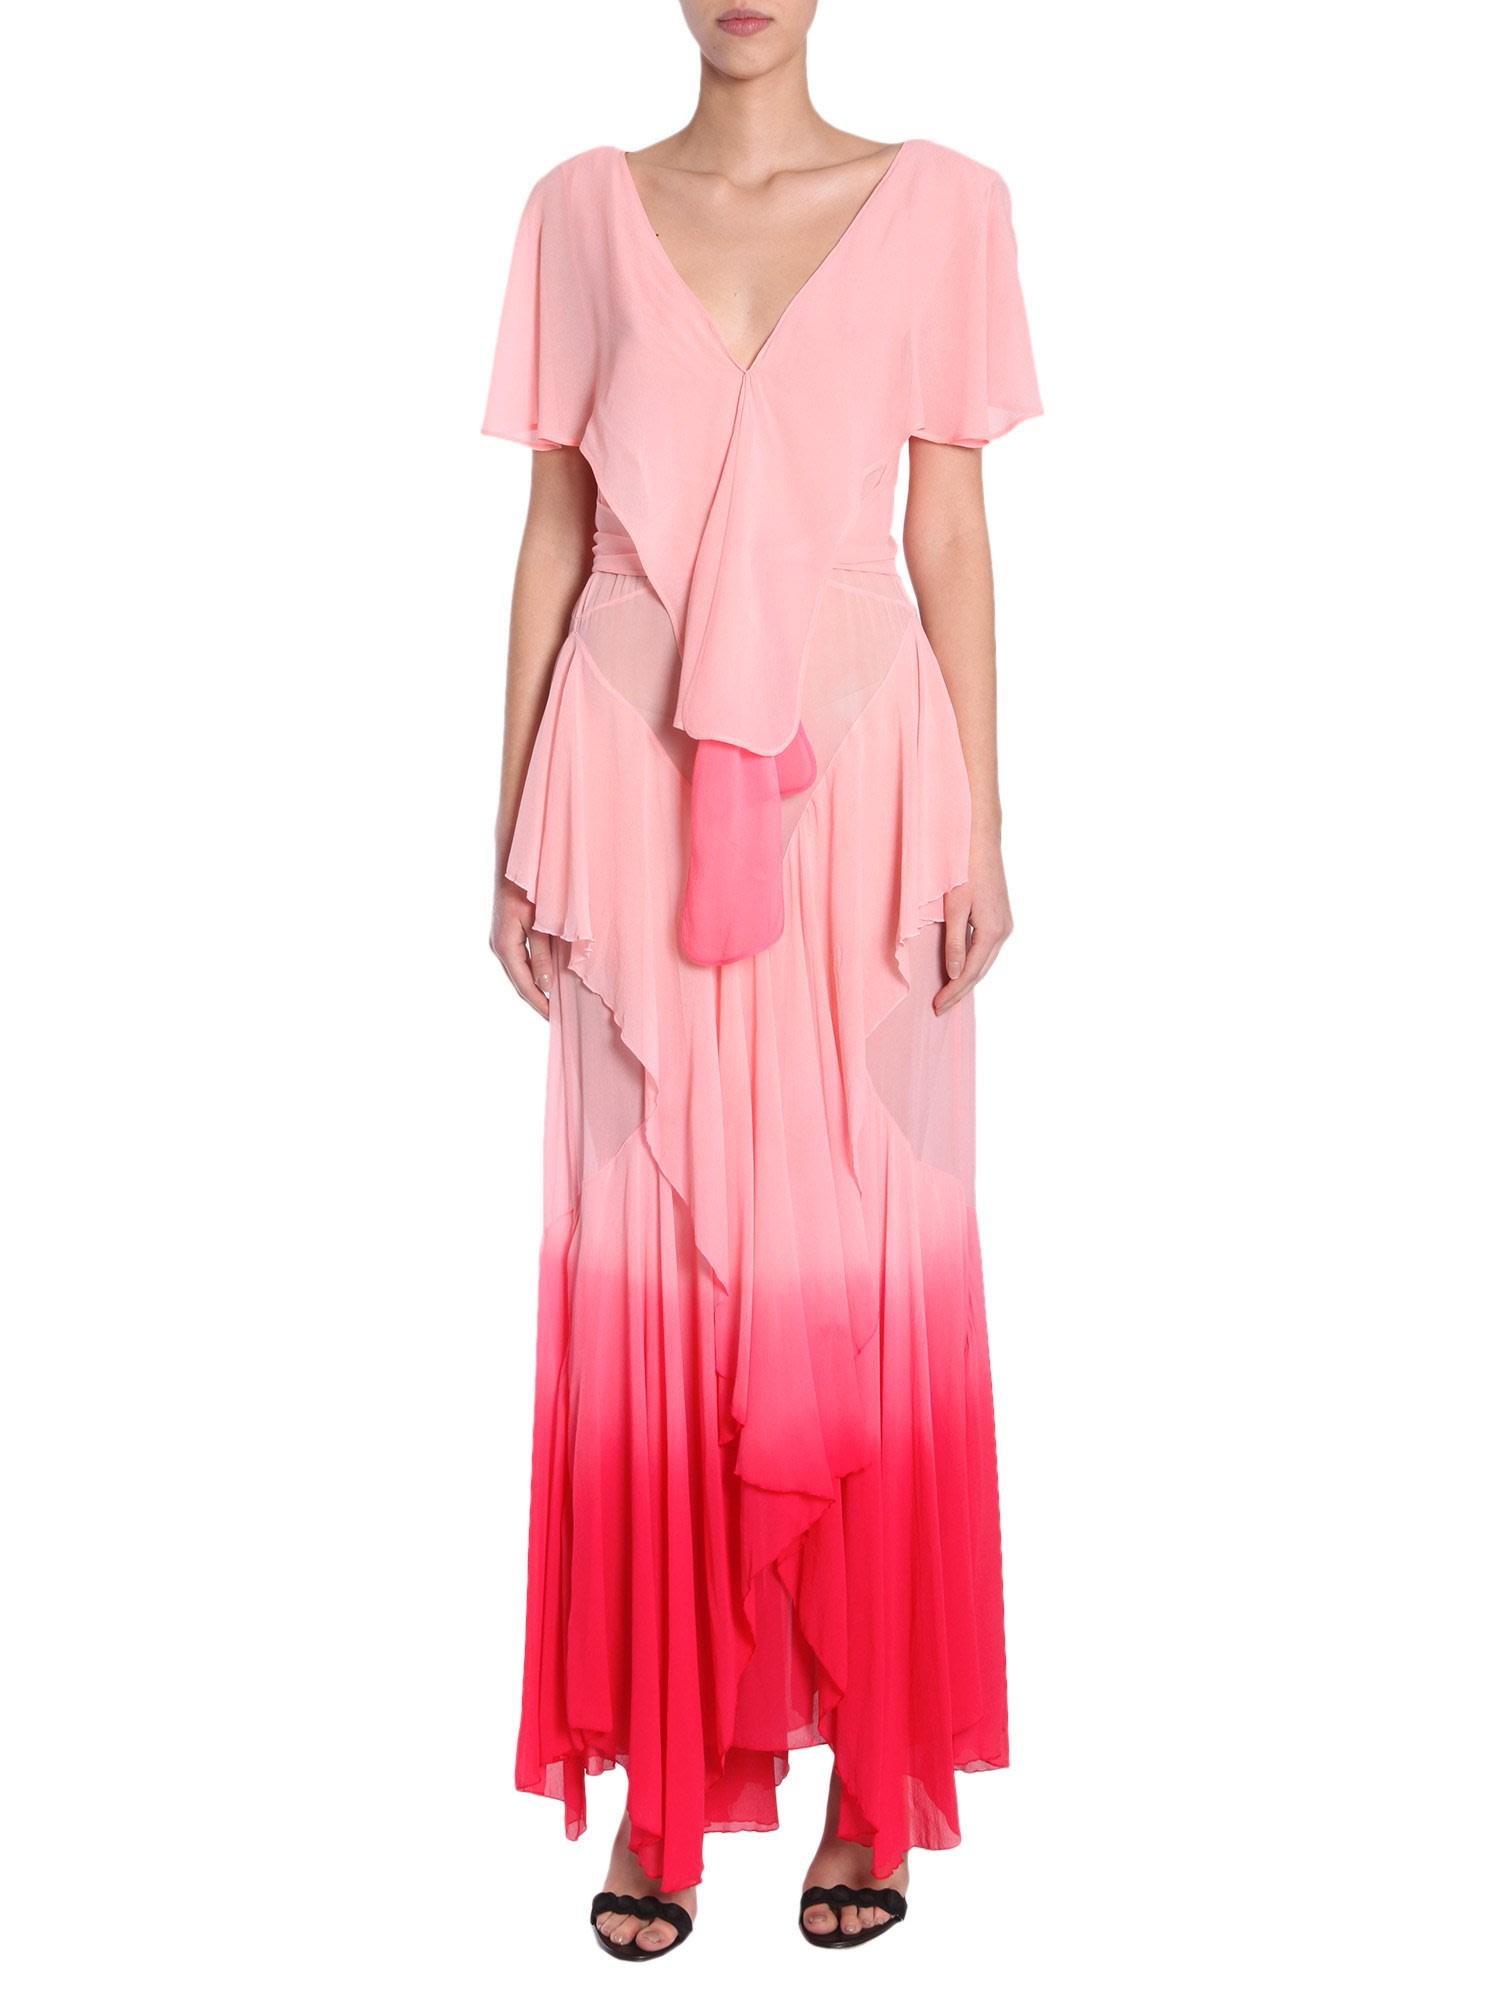 The Attico Long Dress